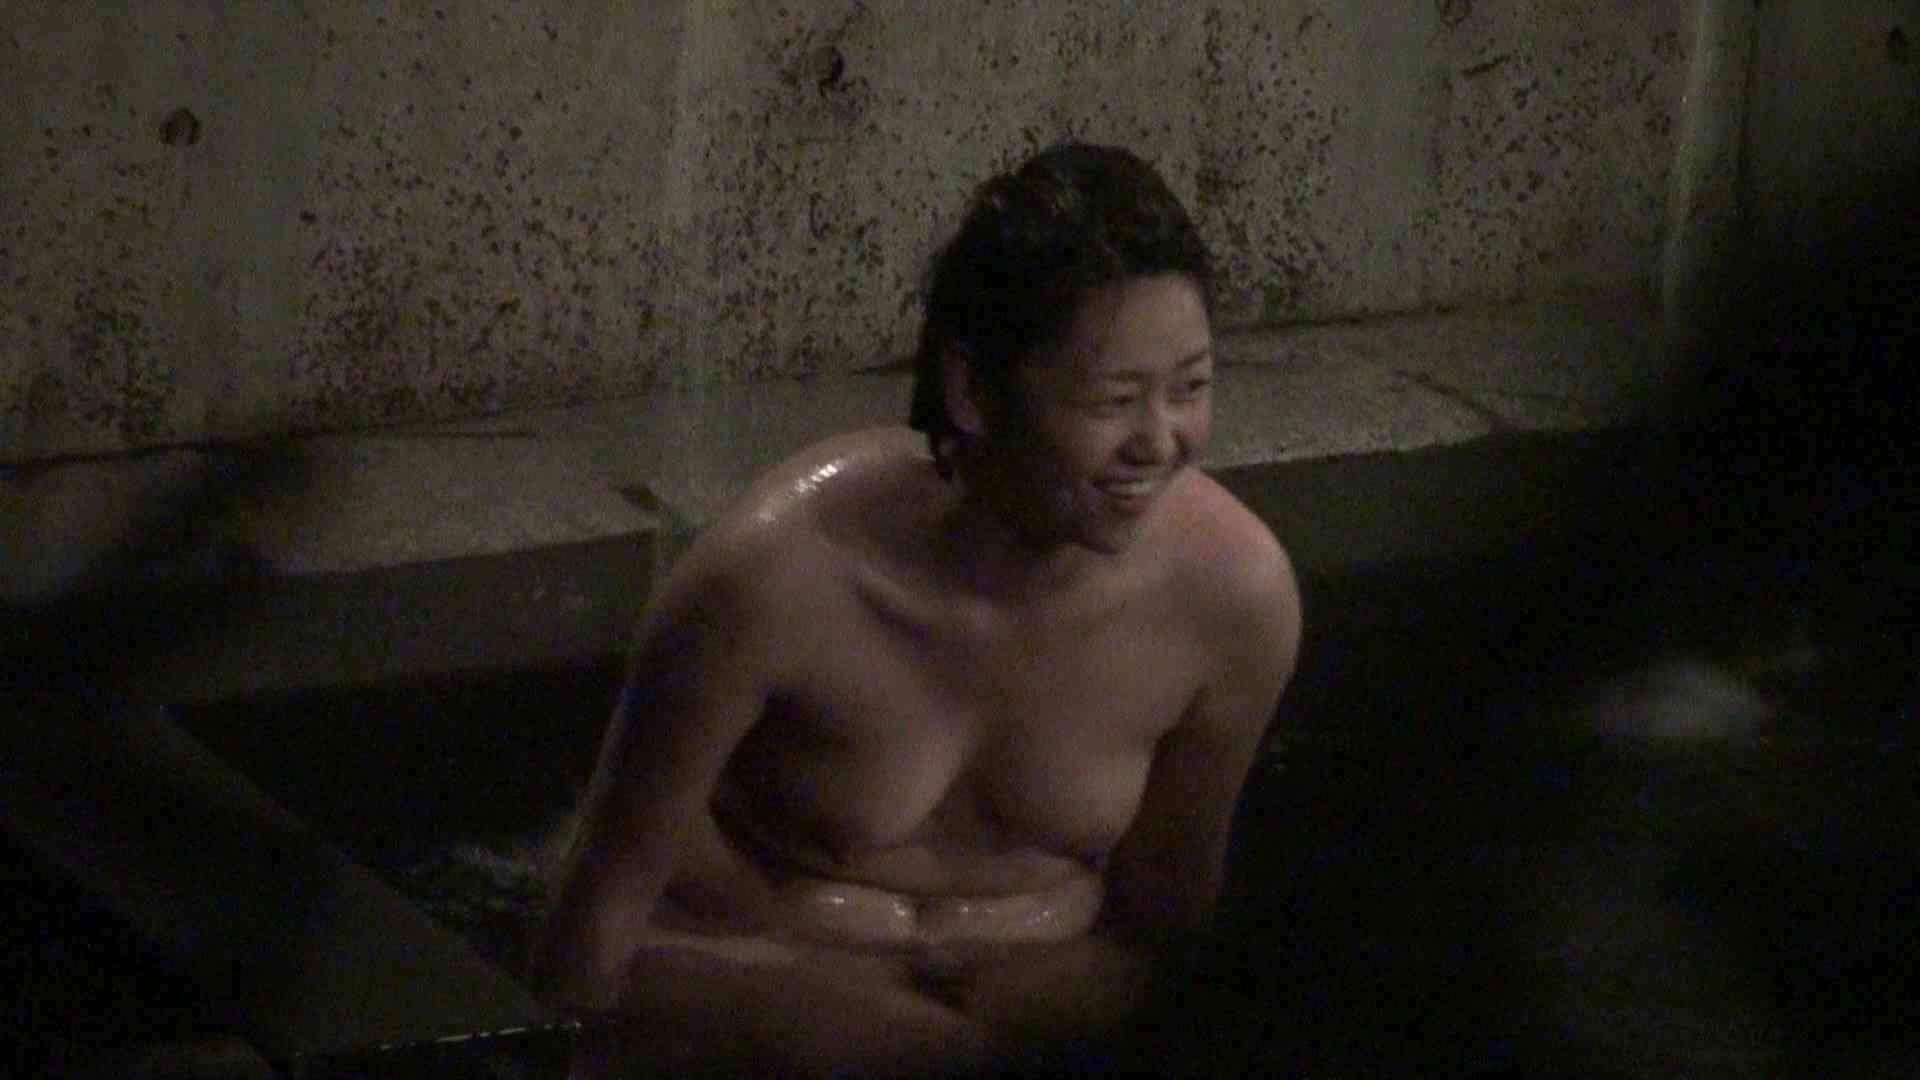 Aquaな露天風呂Vol.342 露天風呂突入 AV無料動画キャプチャ 107pic 74